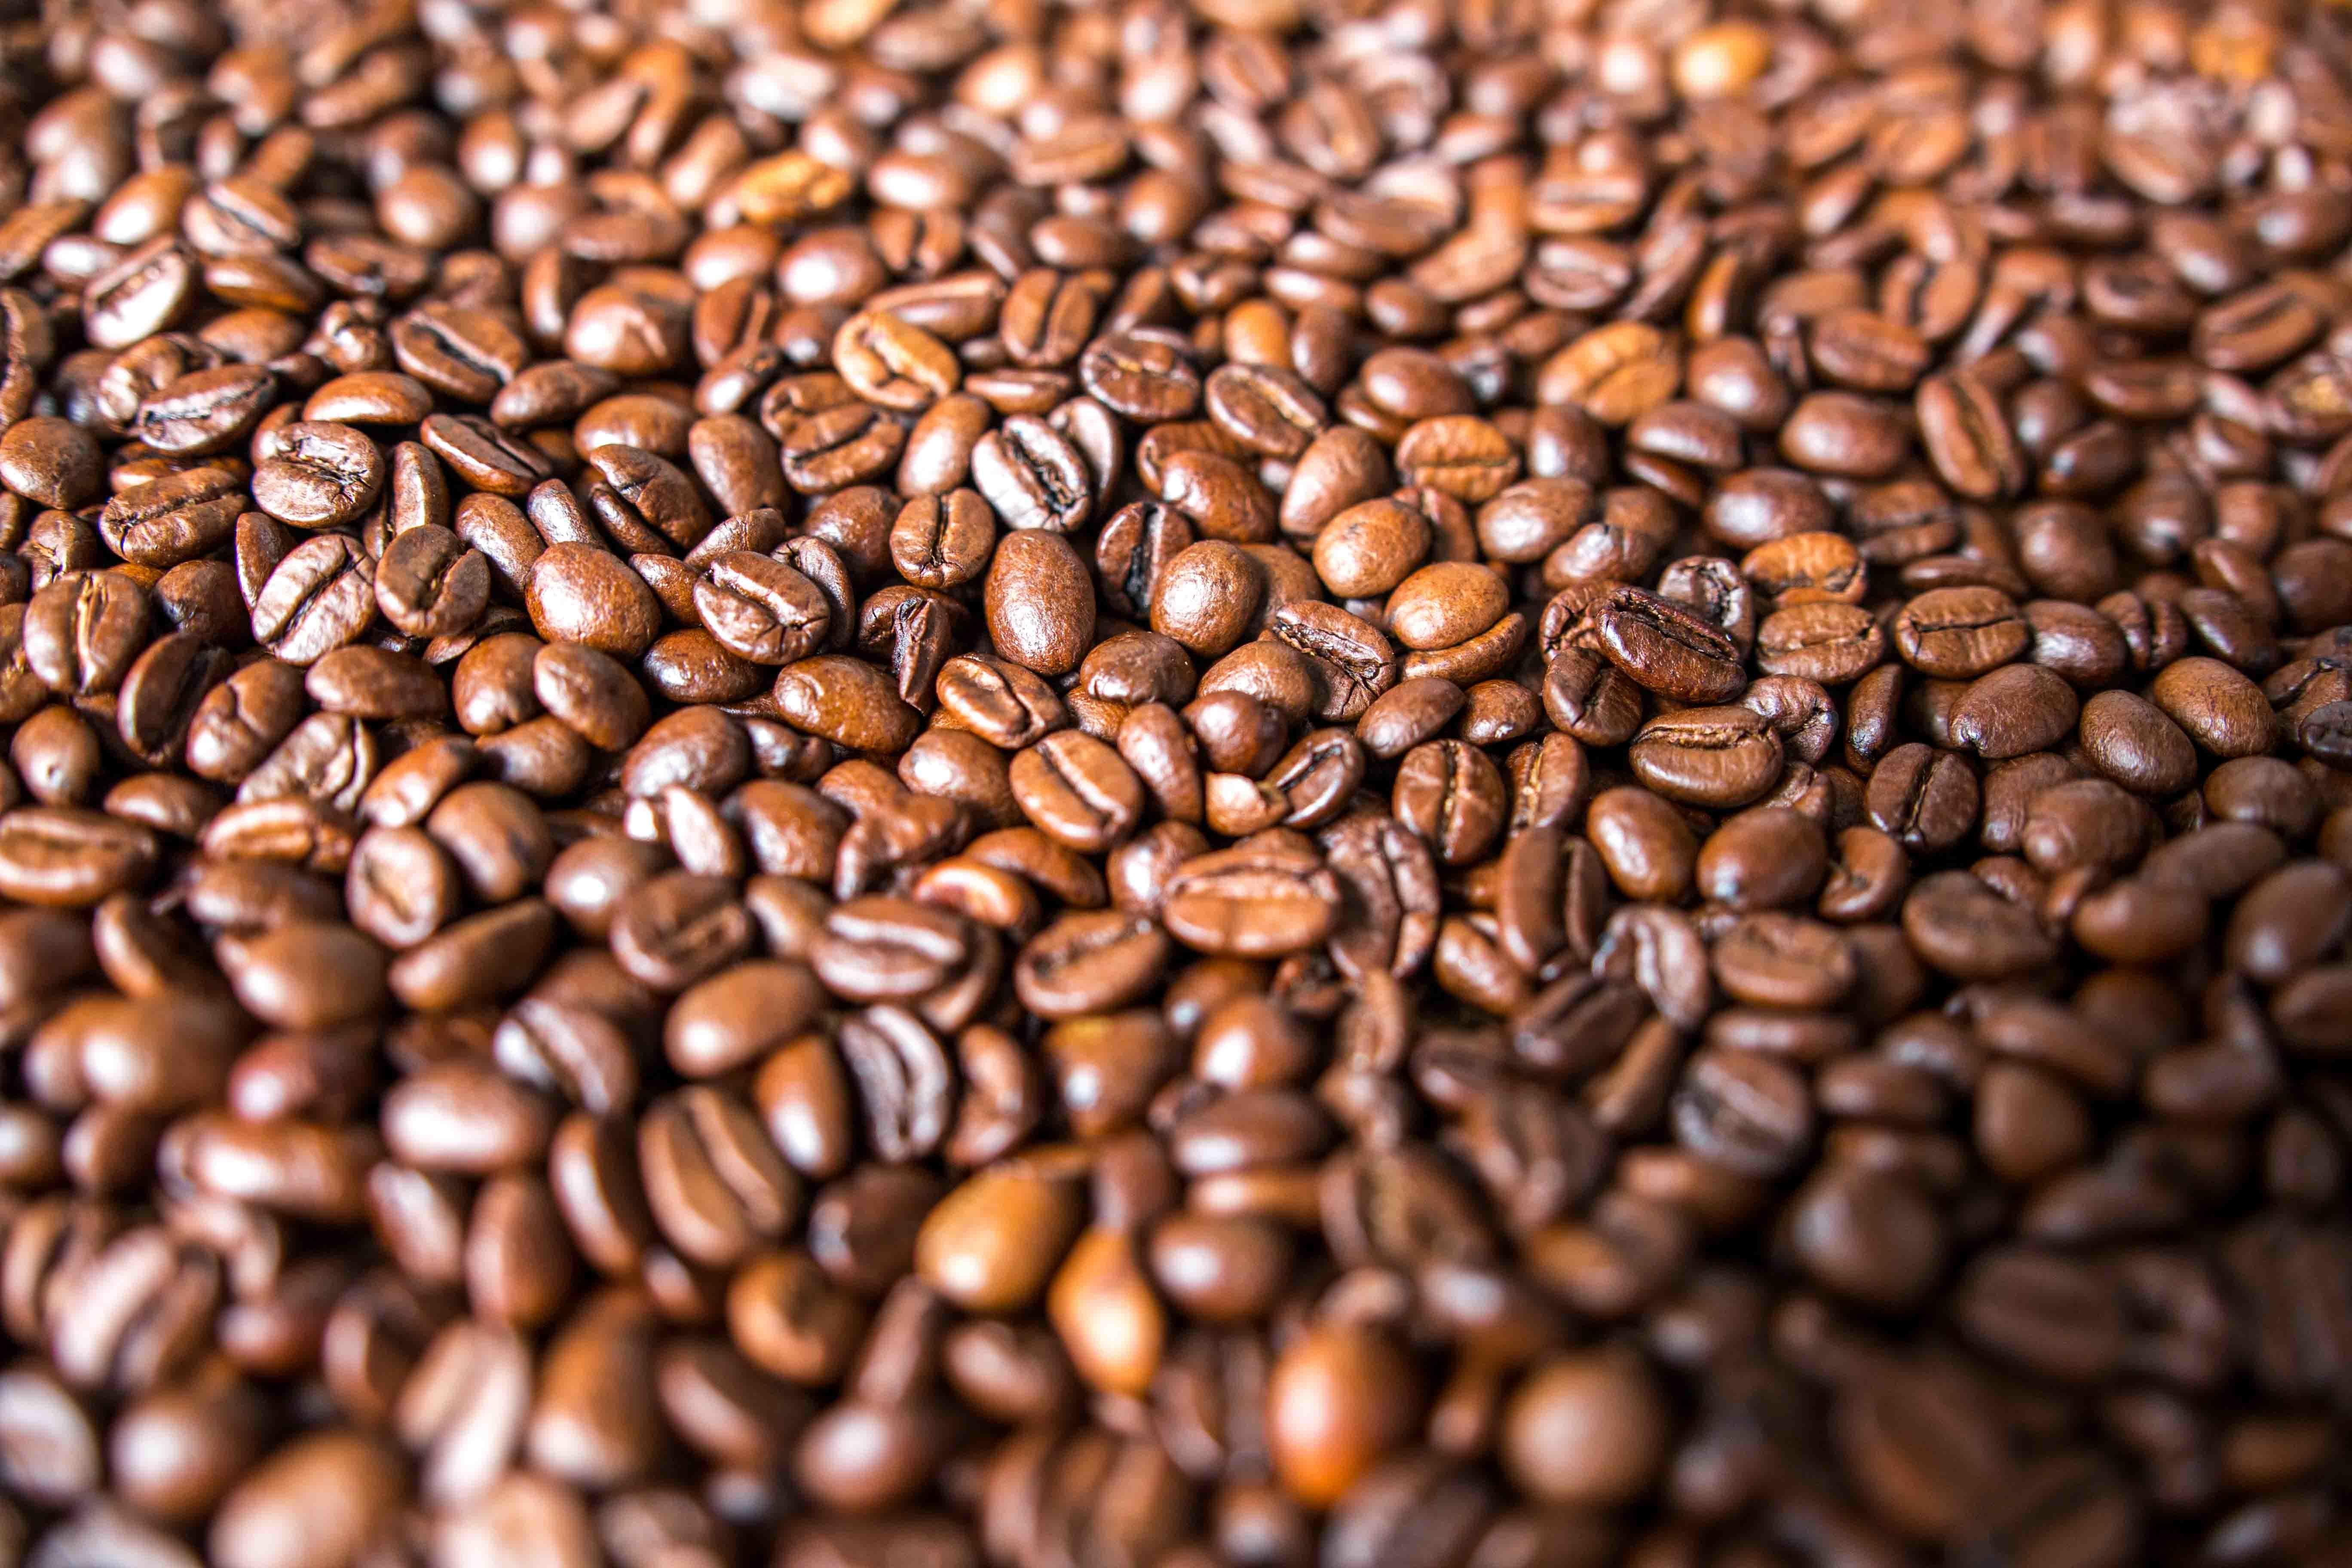 Free Images : seed, coffee bean, food, produce, crop ...